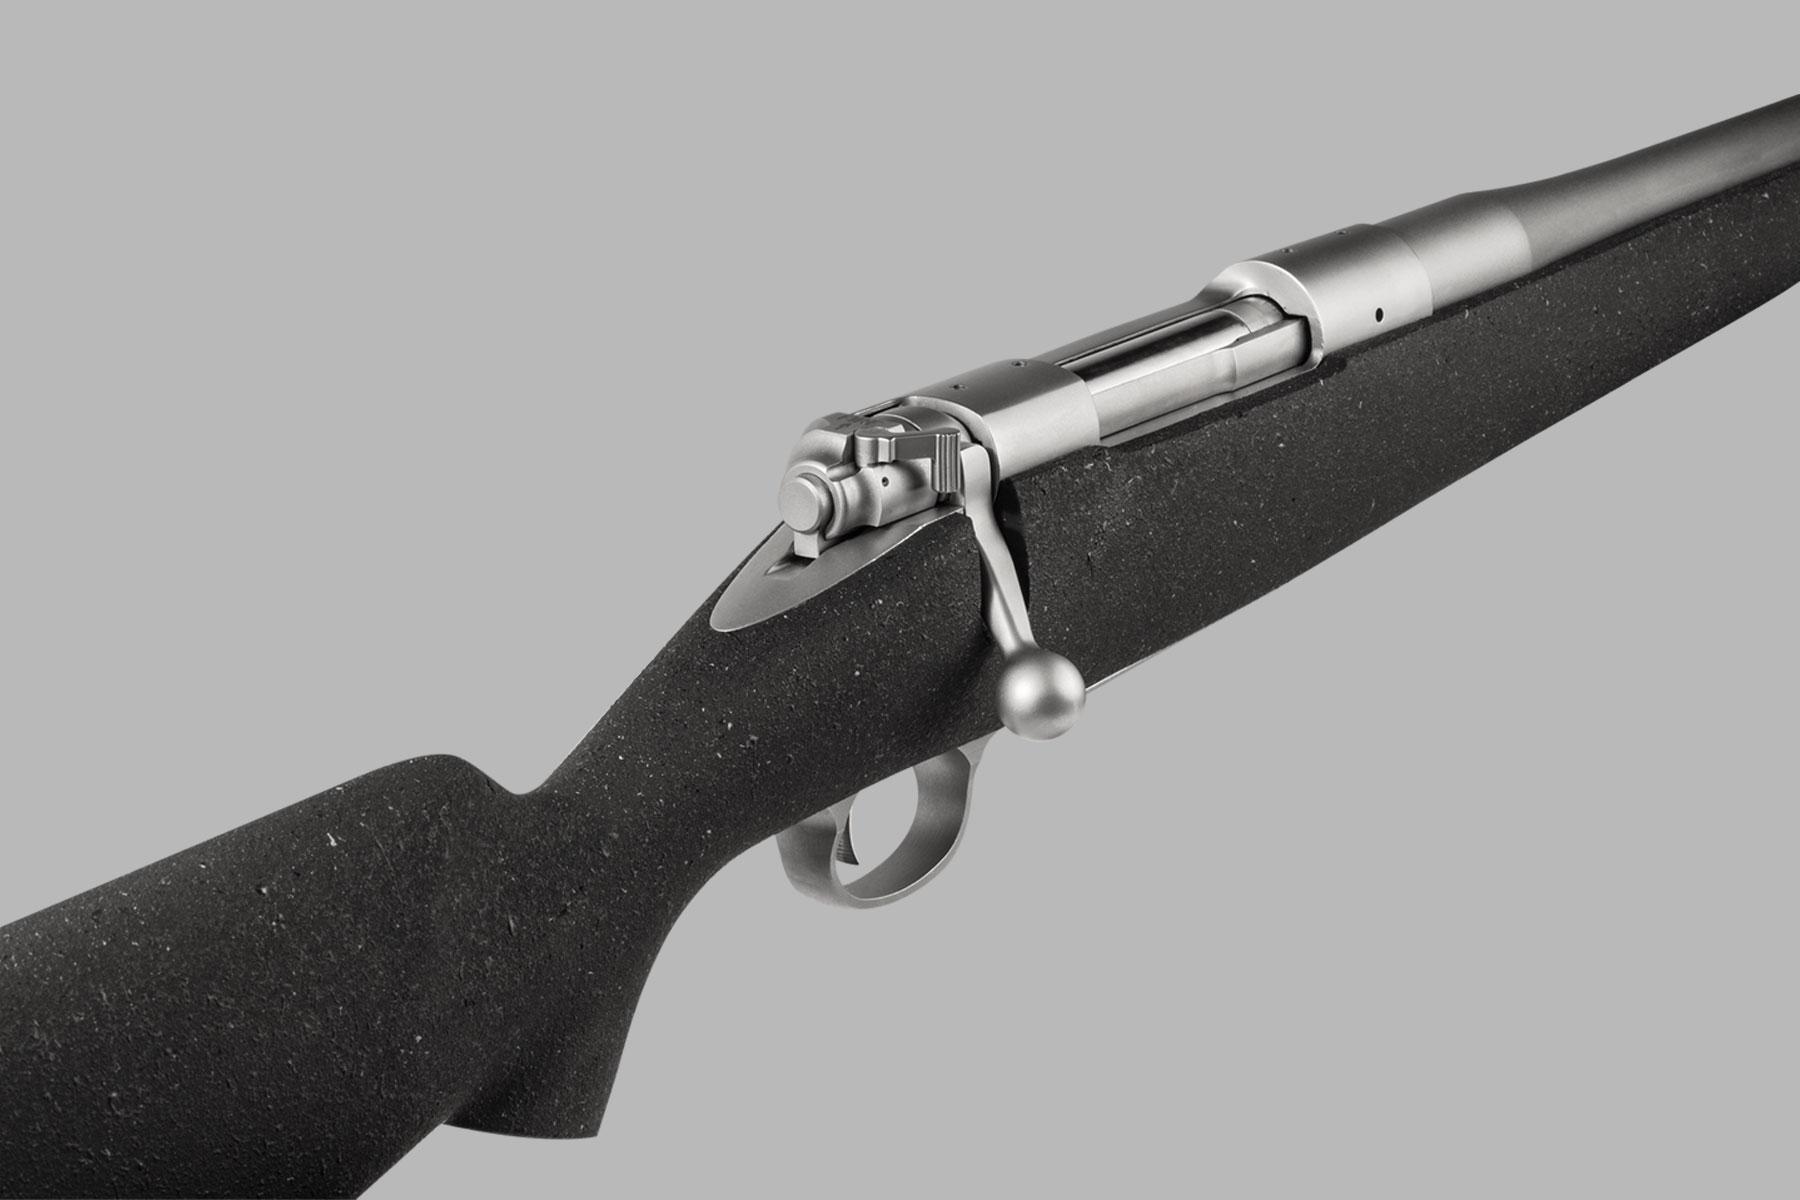 montana-rifle-01.jpg